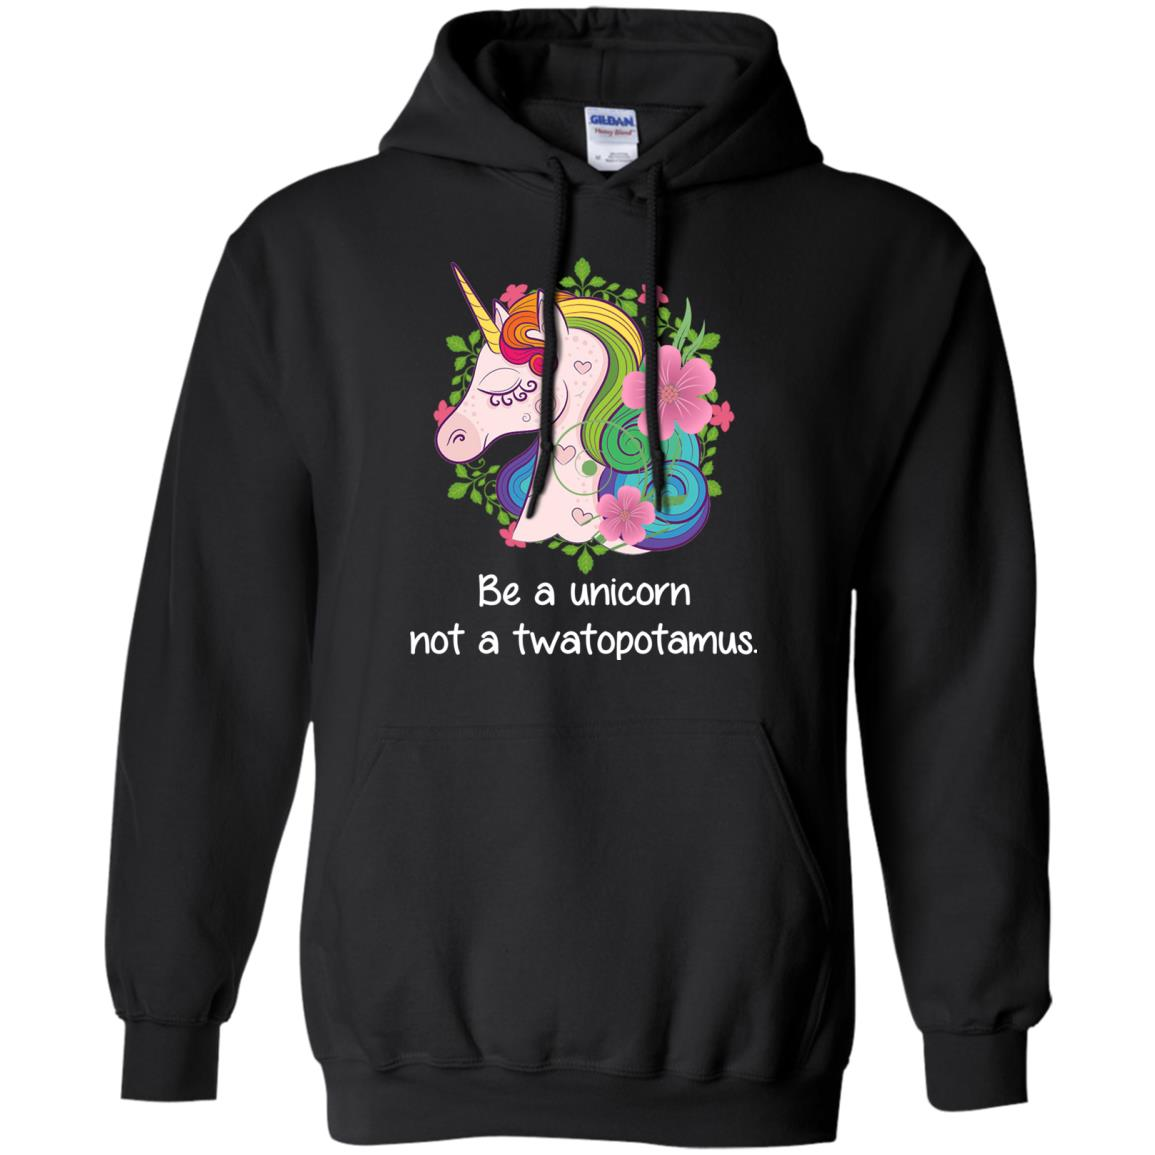 image 412 - Be a Unicorn Not a Twatopotamus Shirt, Sweatshirt, Hoodie